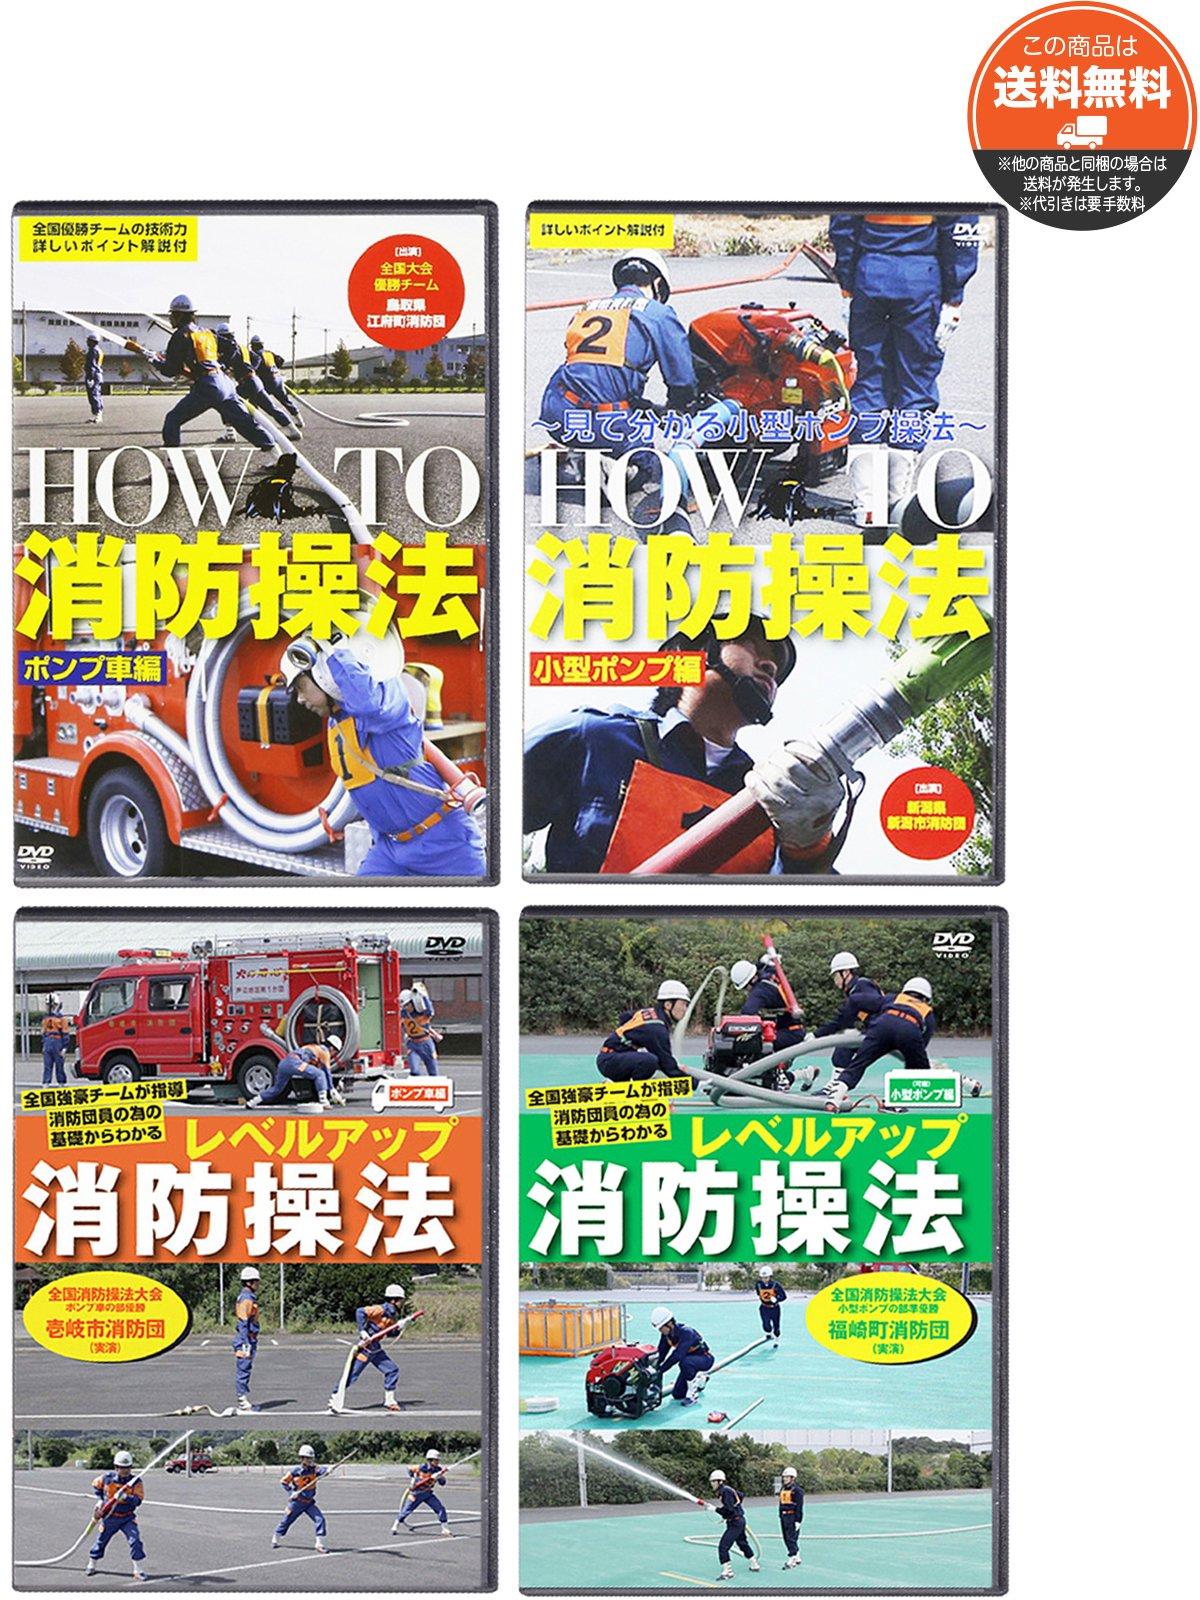 【DVD】消防操法DVD【HOW TO】&【レベルアップ】4点セット【画像2】